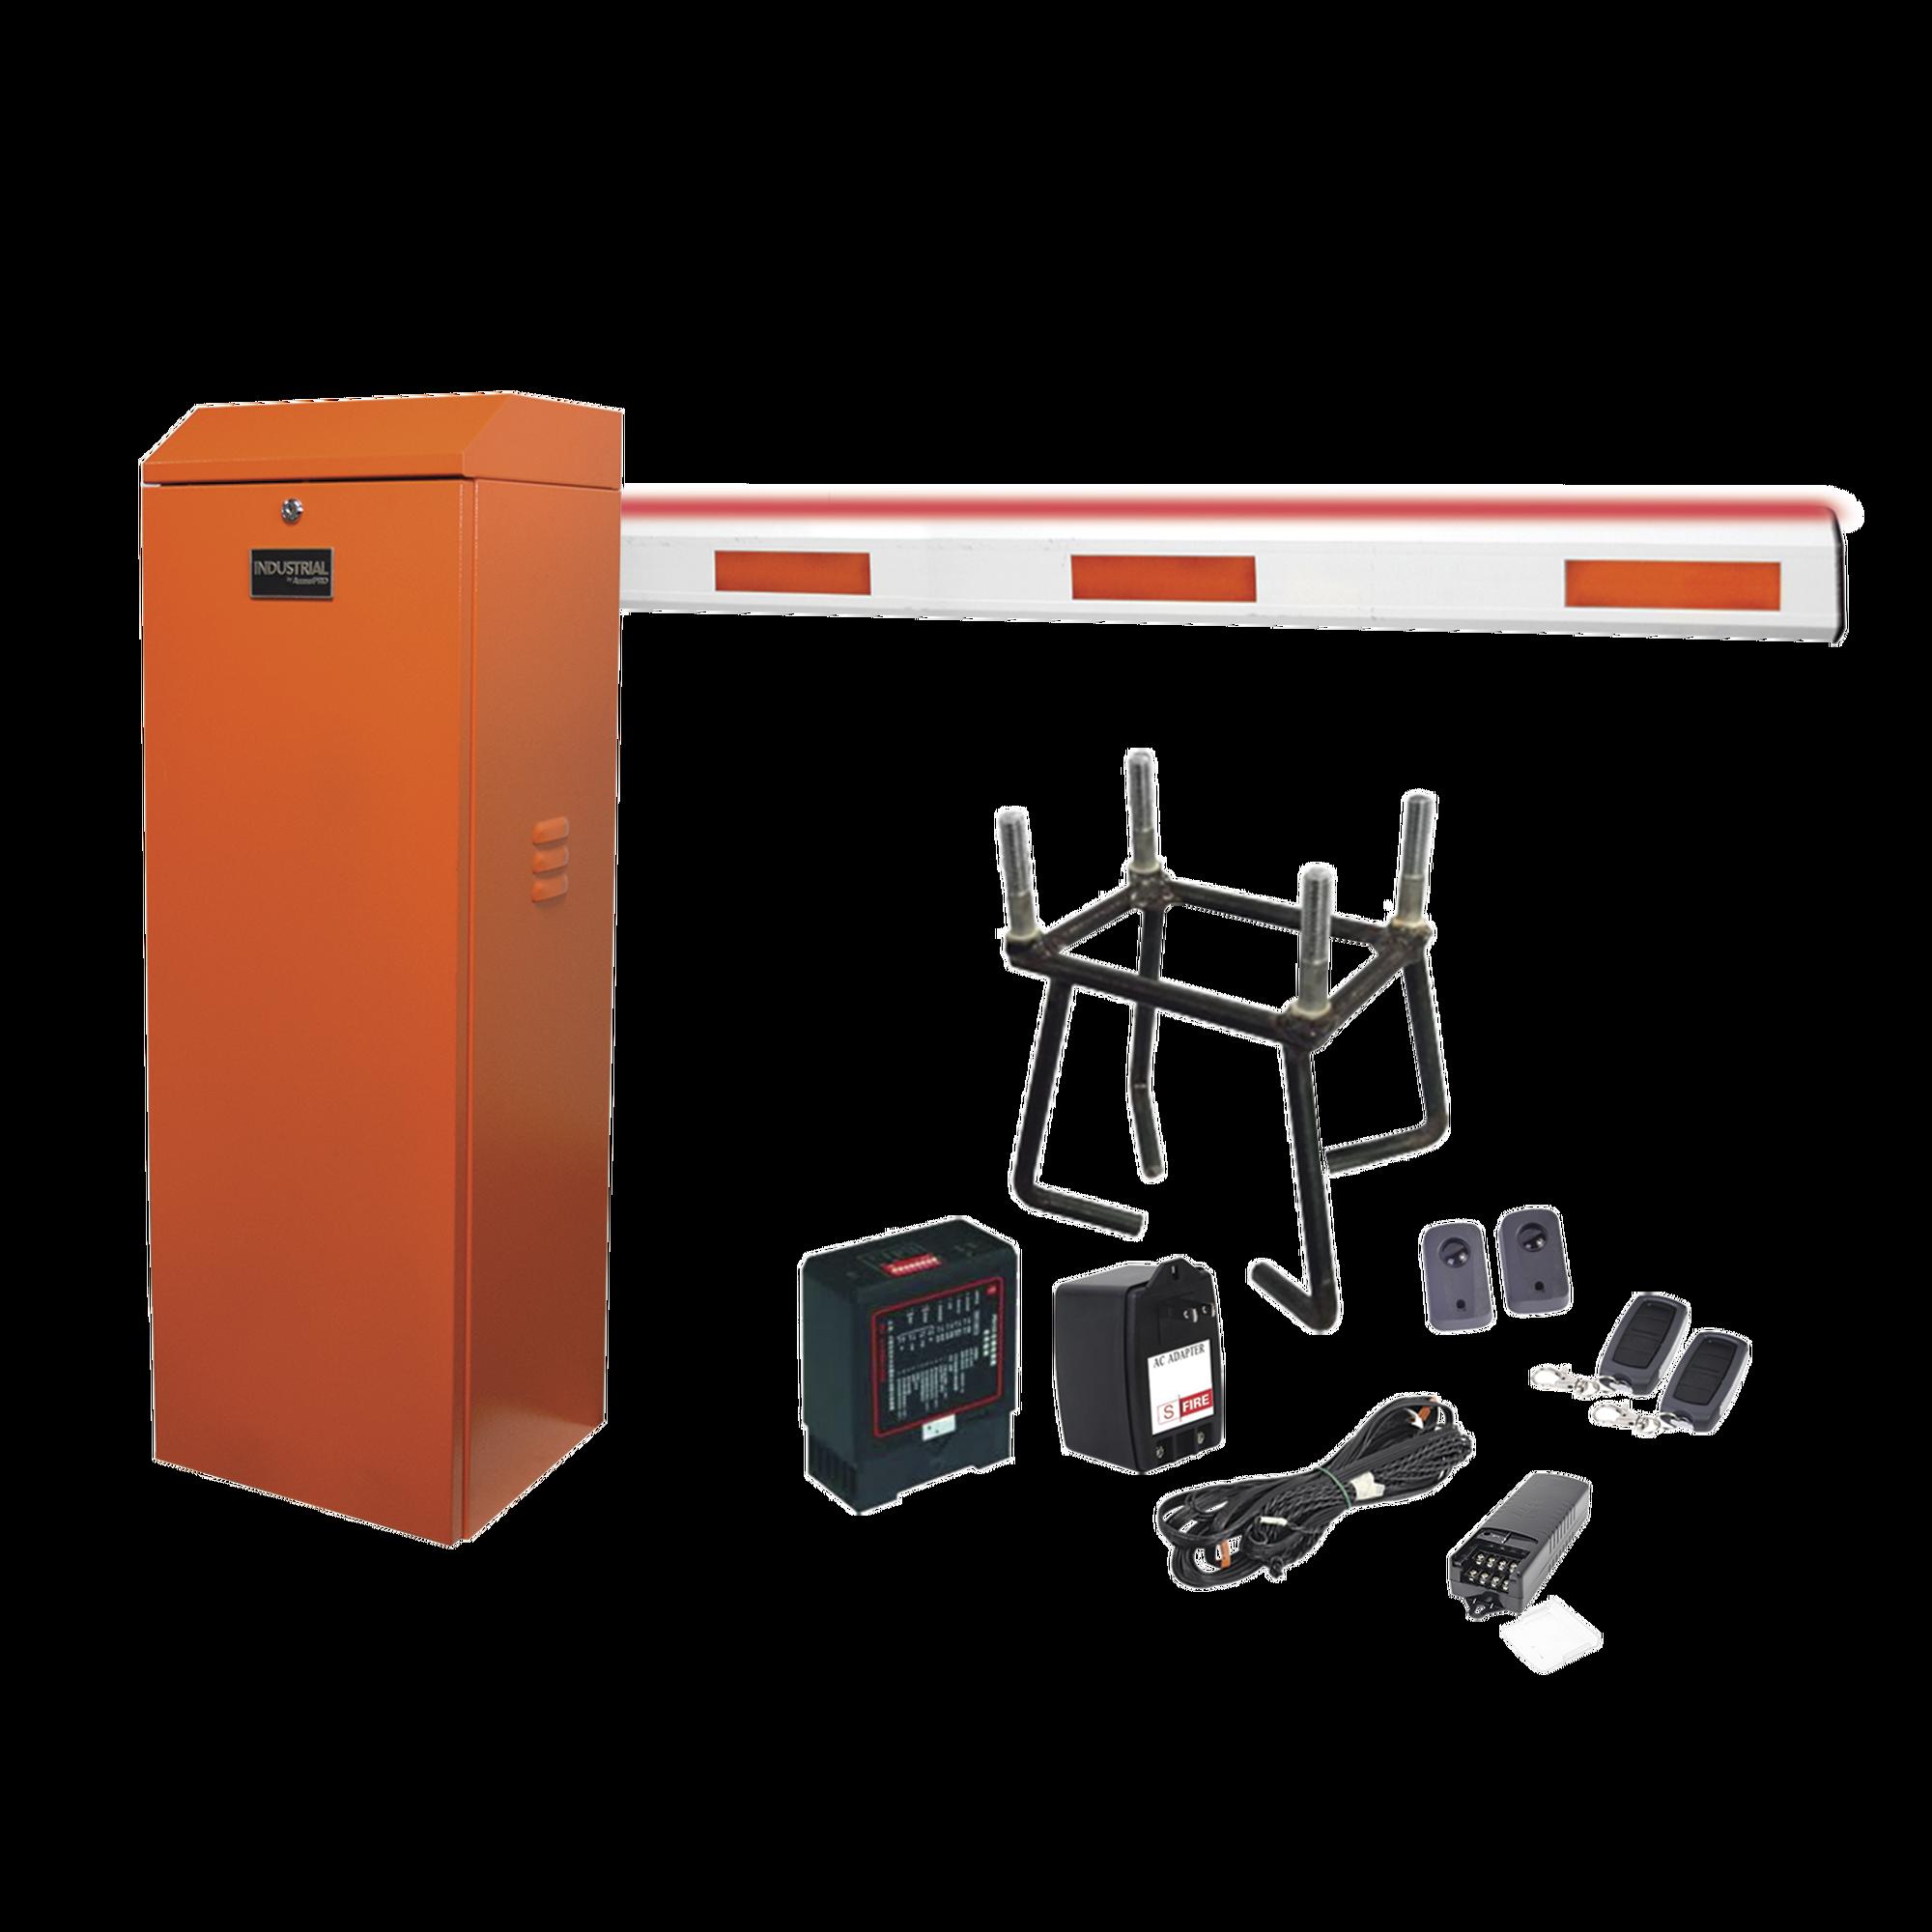 Kit COMPLETO Barrera Derecha XB ANARANJADA / 5M / Inluminacion LED Rojo-Verde / Incluye Sensor de masa, Transformador, Lazo, Ancla, Fotoceldas 2 Controles Inalámbricos